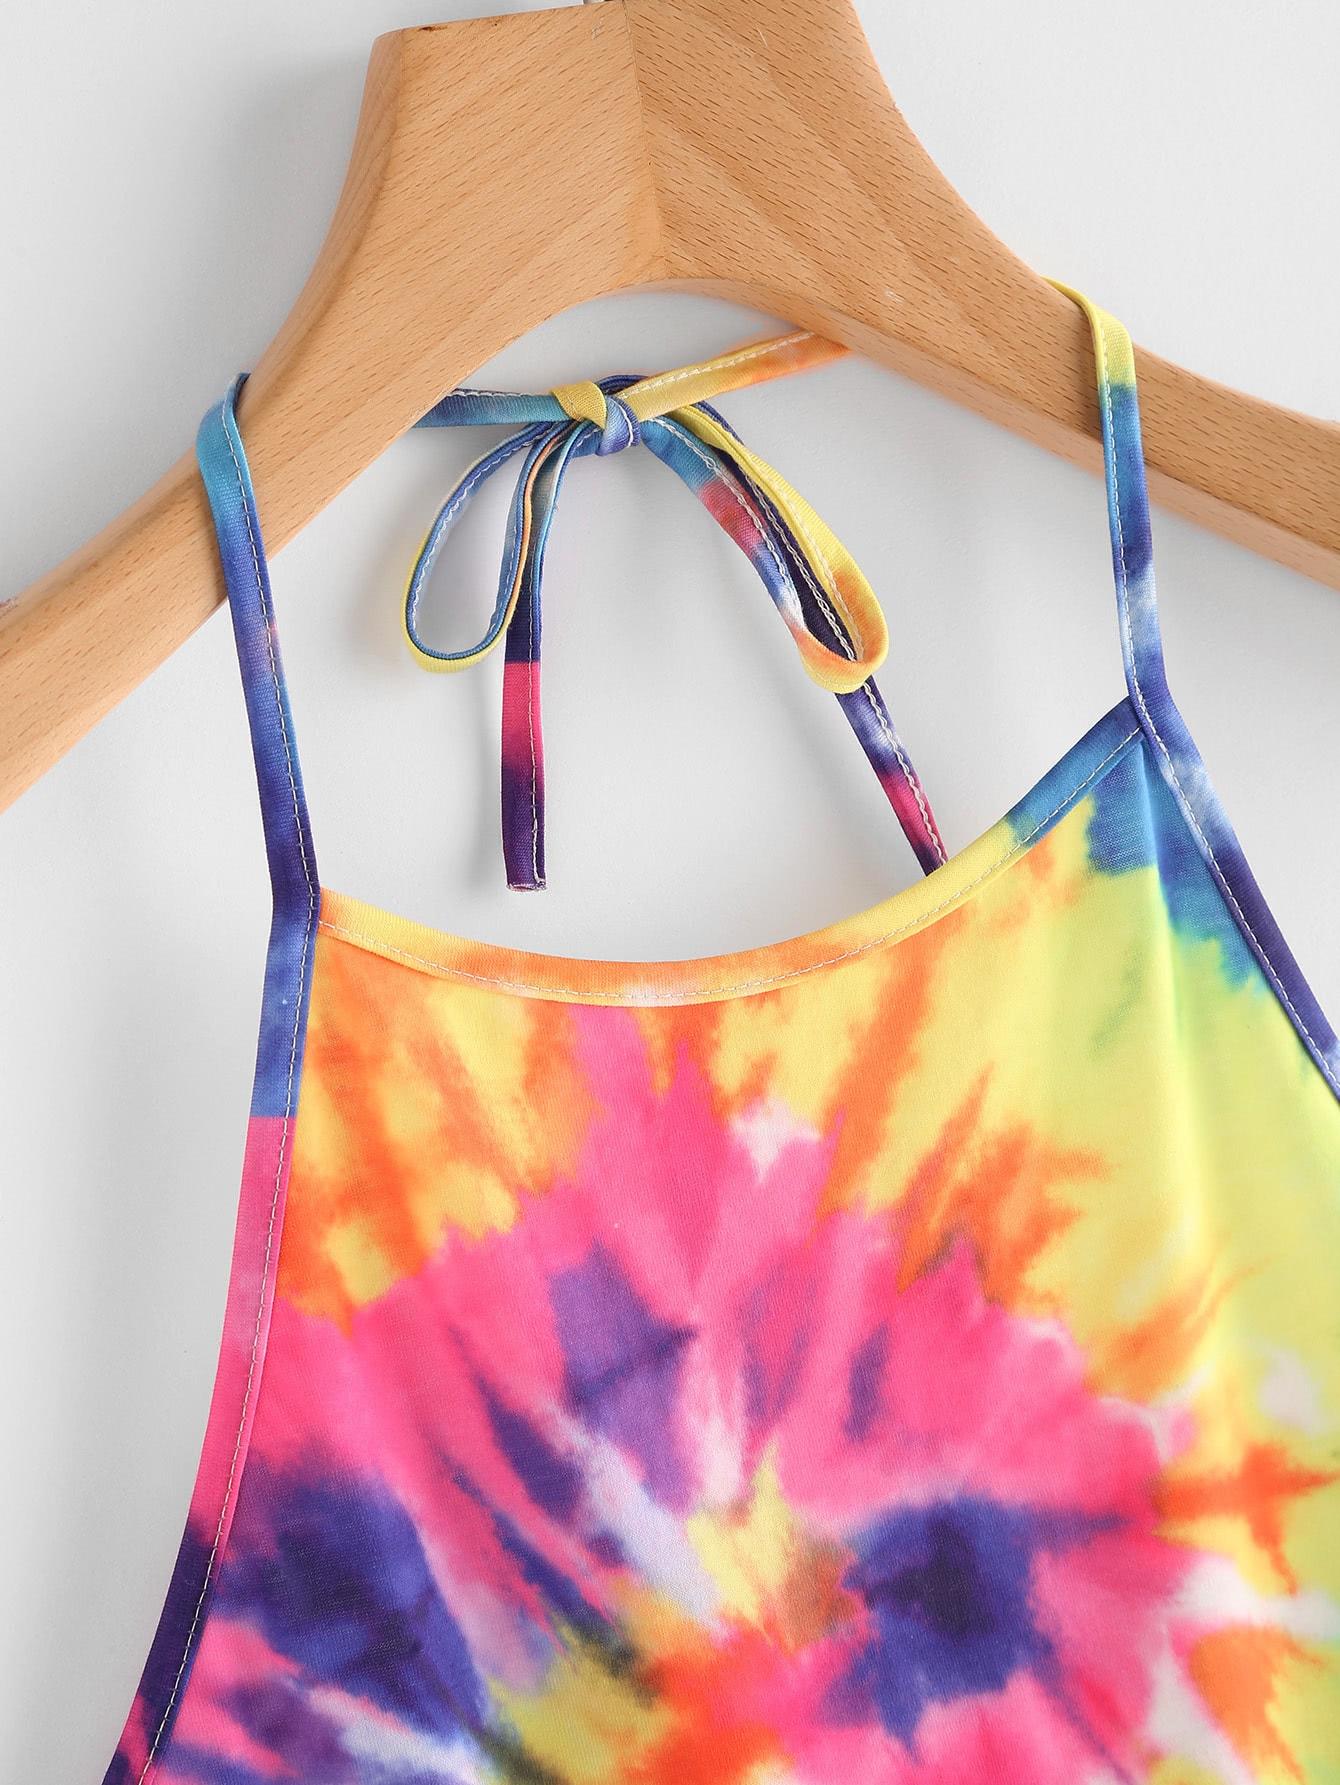 Spiral Tie Dye Print Tie Halter Top